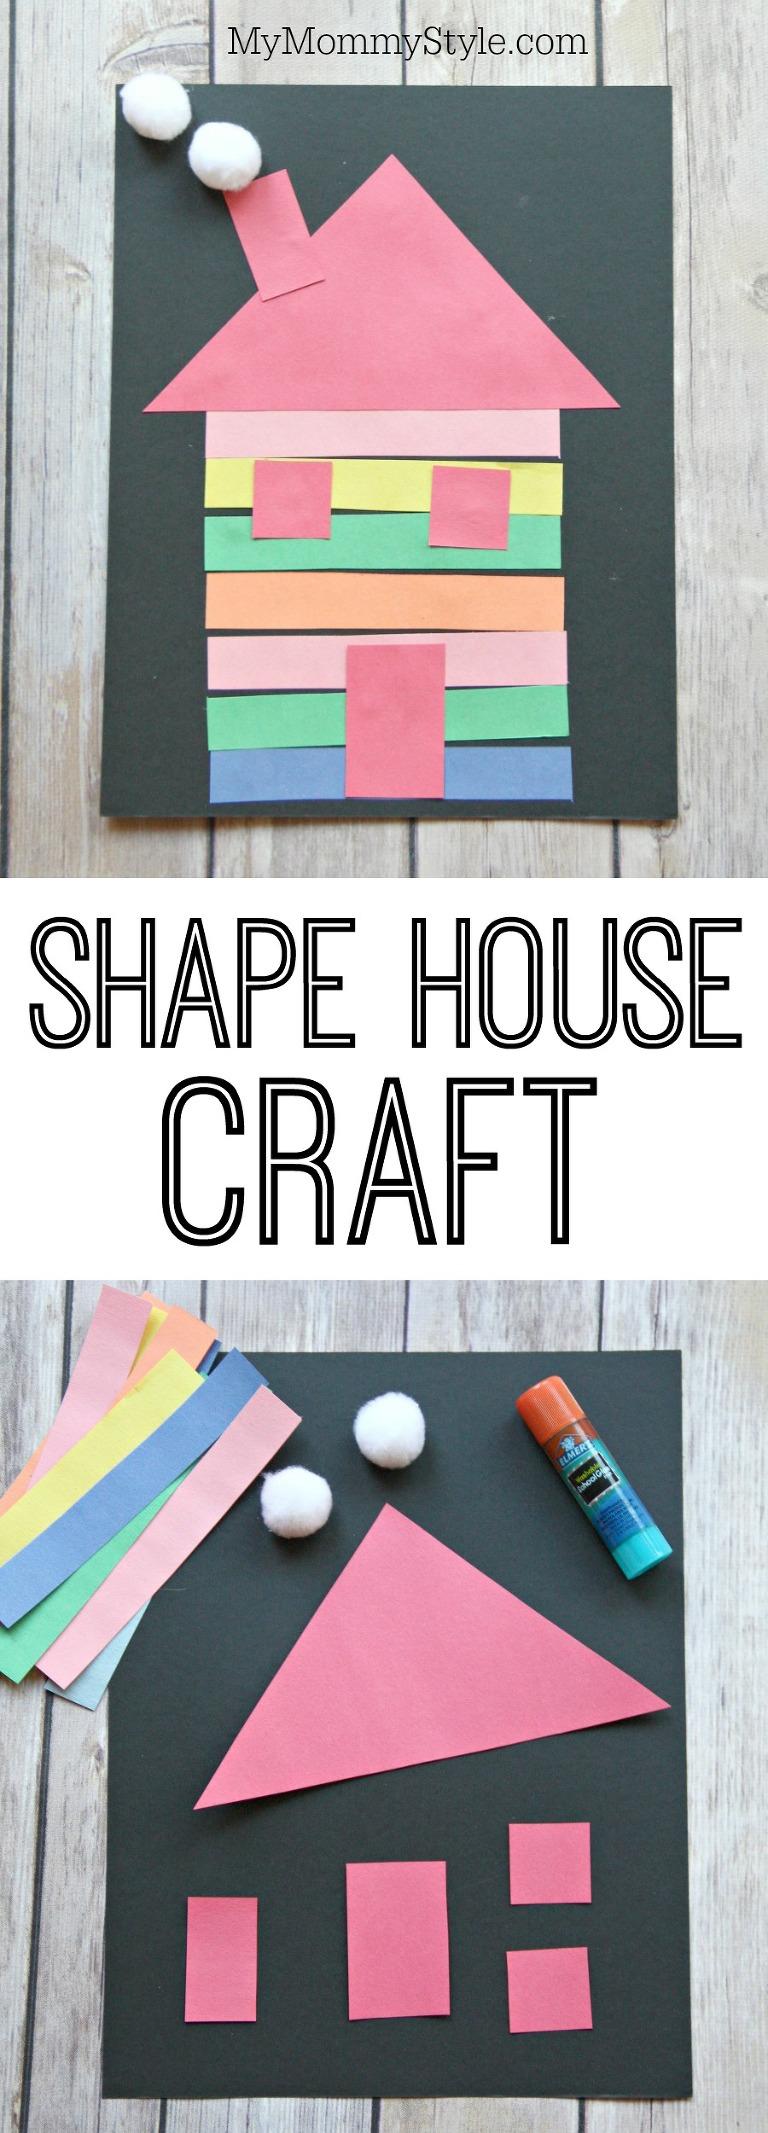 Shape house craft for preschoolers